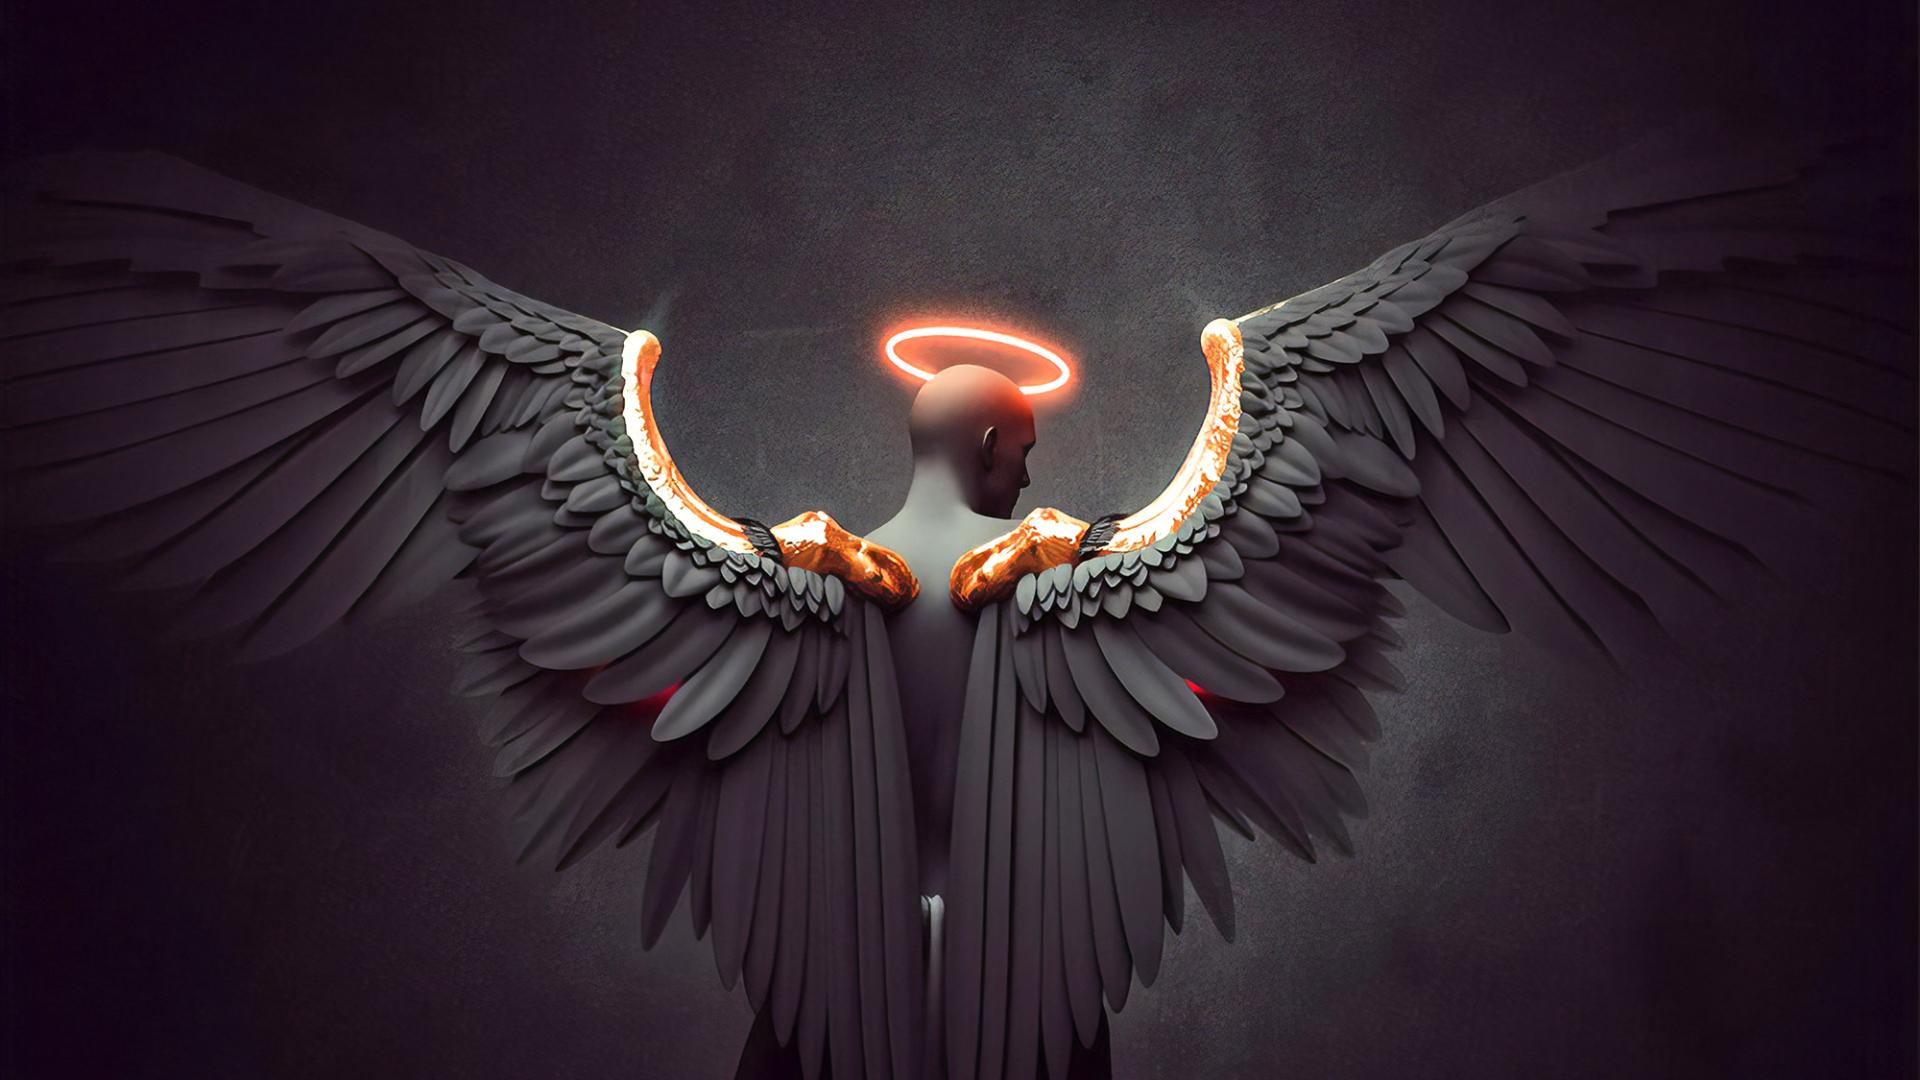 Free Download Fantasy Angel Wings Hd Wallpaper Wallpaper